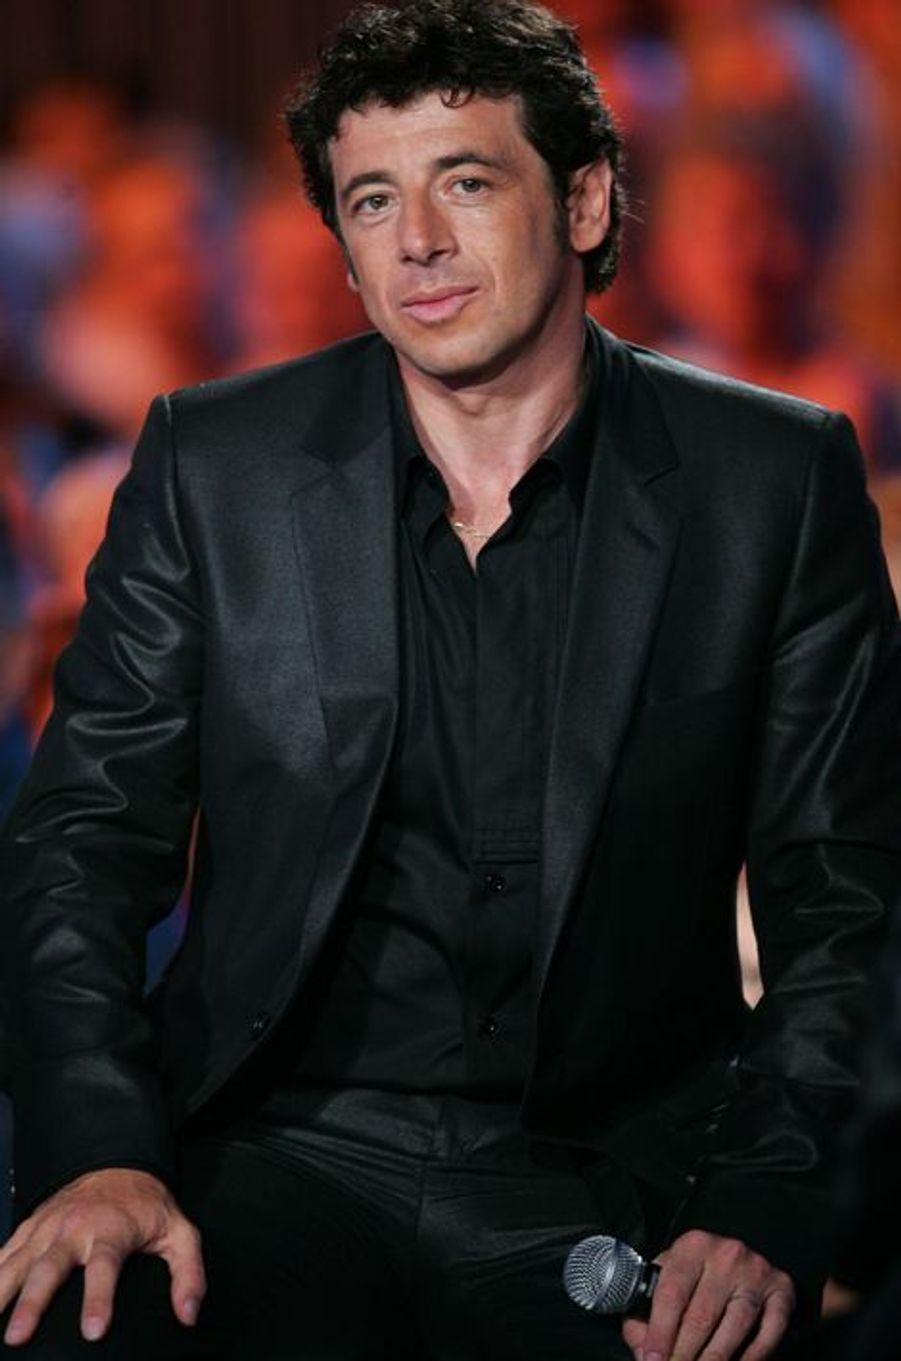 Patrick Bruel à Cannes le 20 mai 2007.